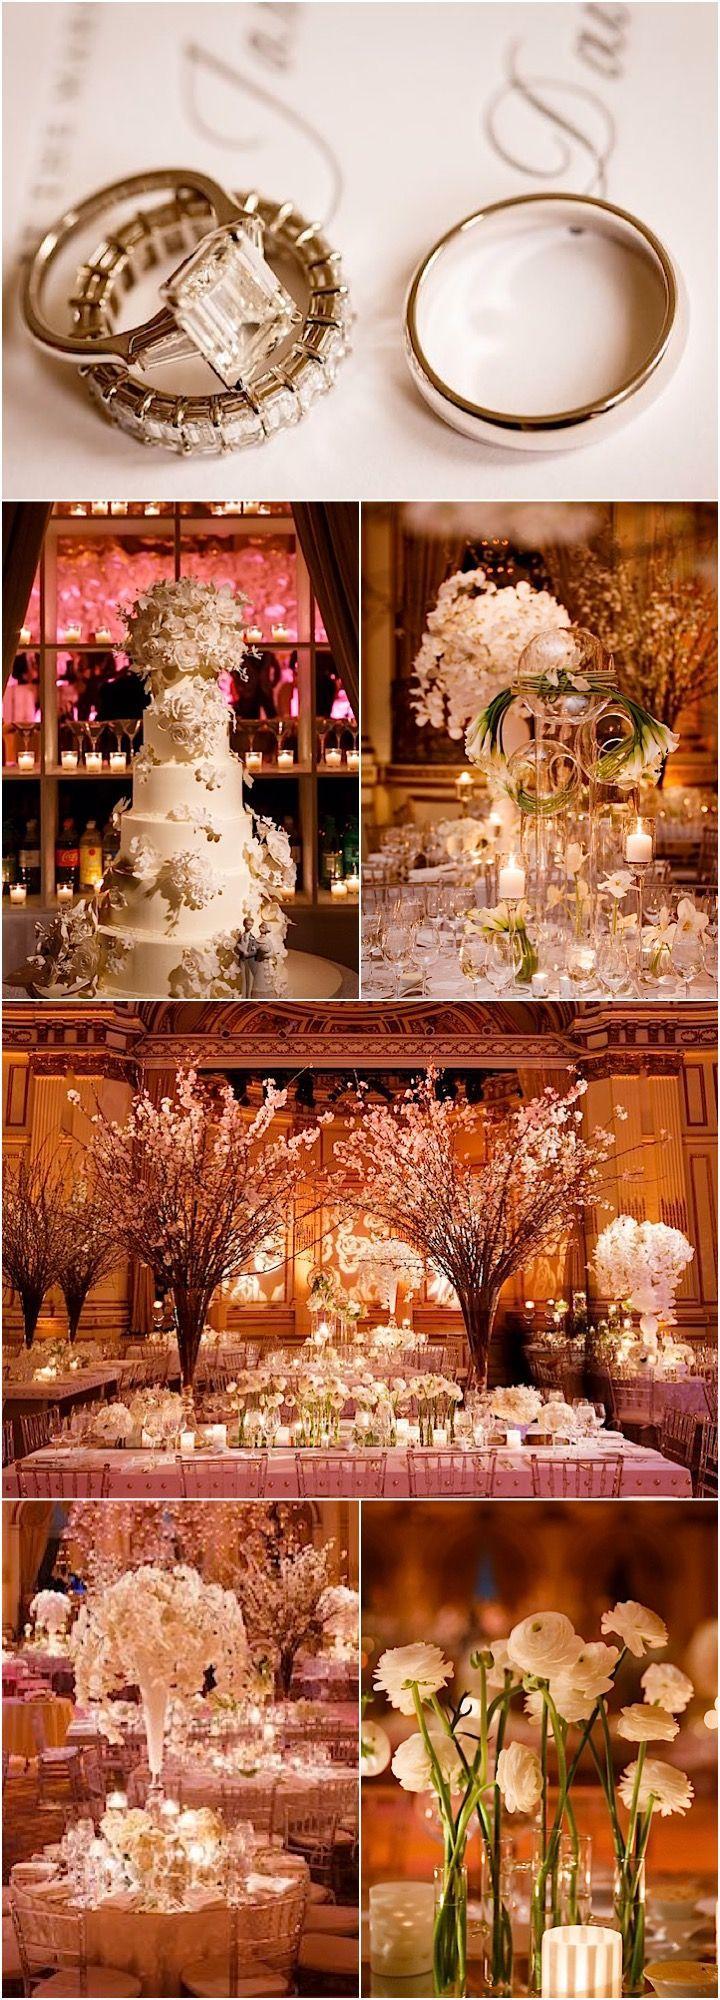 Luxurious New York Wedding At The Plaza Hotel 2776978 Weddbook